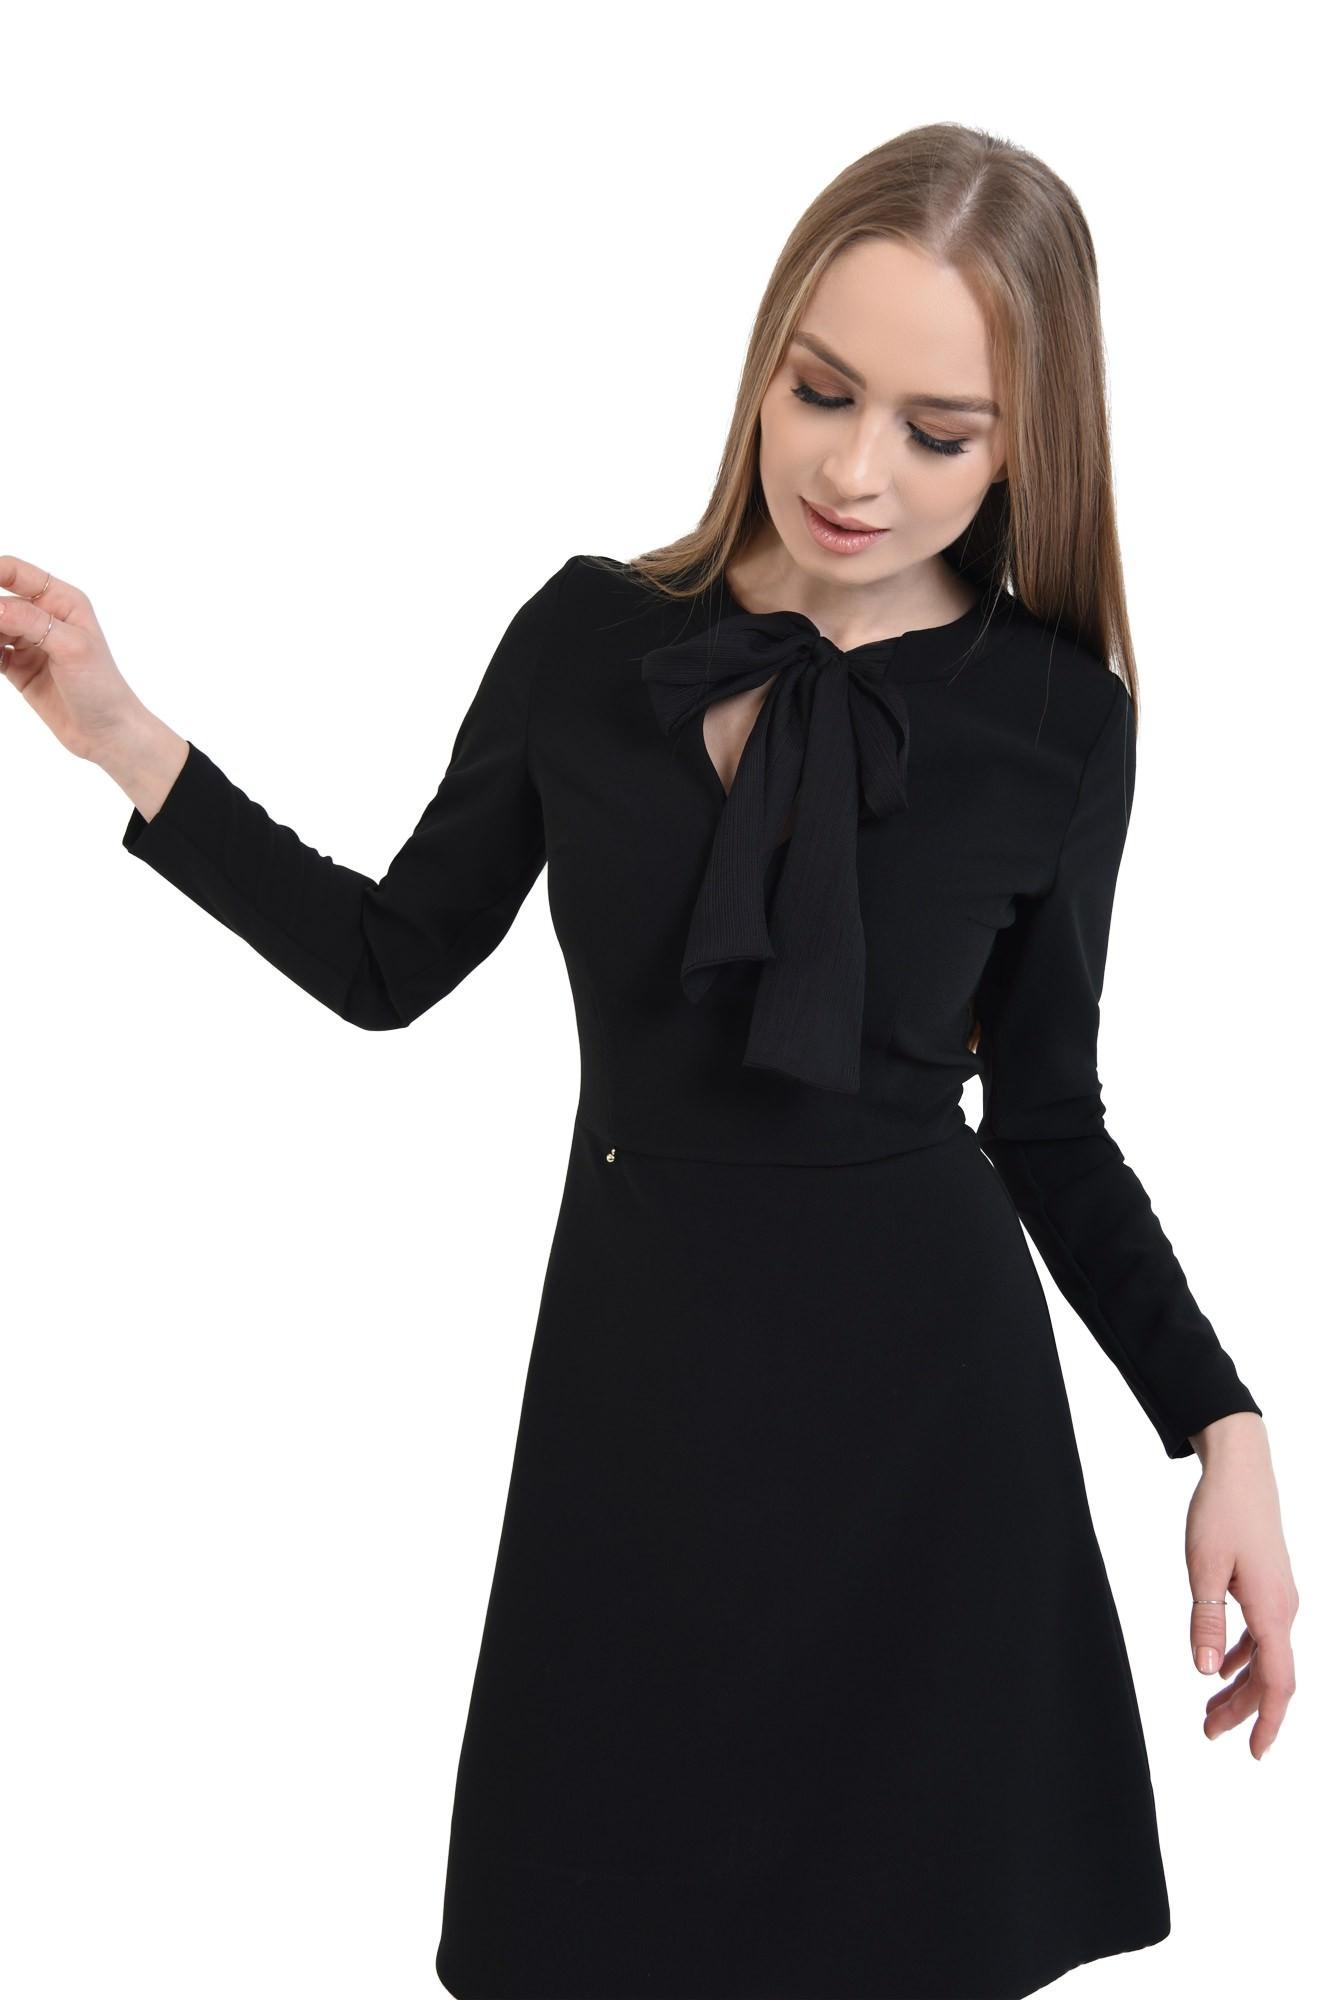 0 - rochie mini, croi A-line, talie cambrata, rochii online